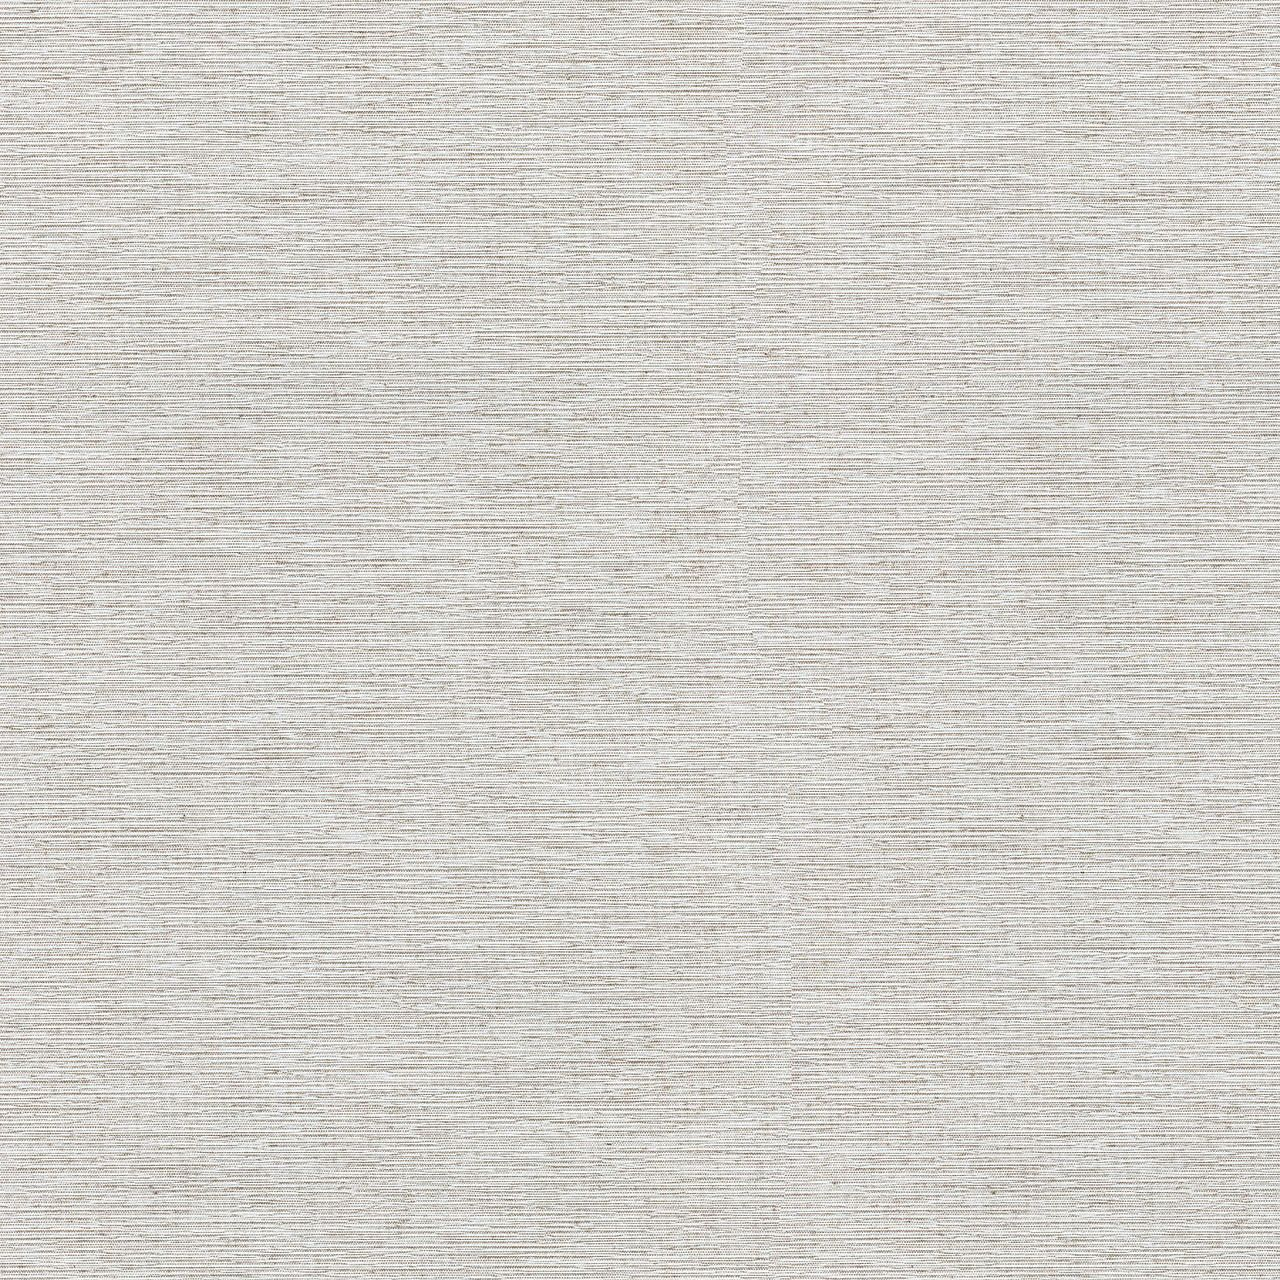 Brightout Fabric Nova Birch